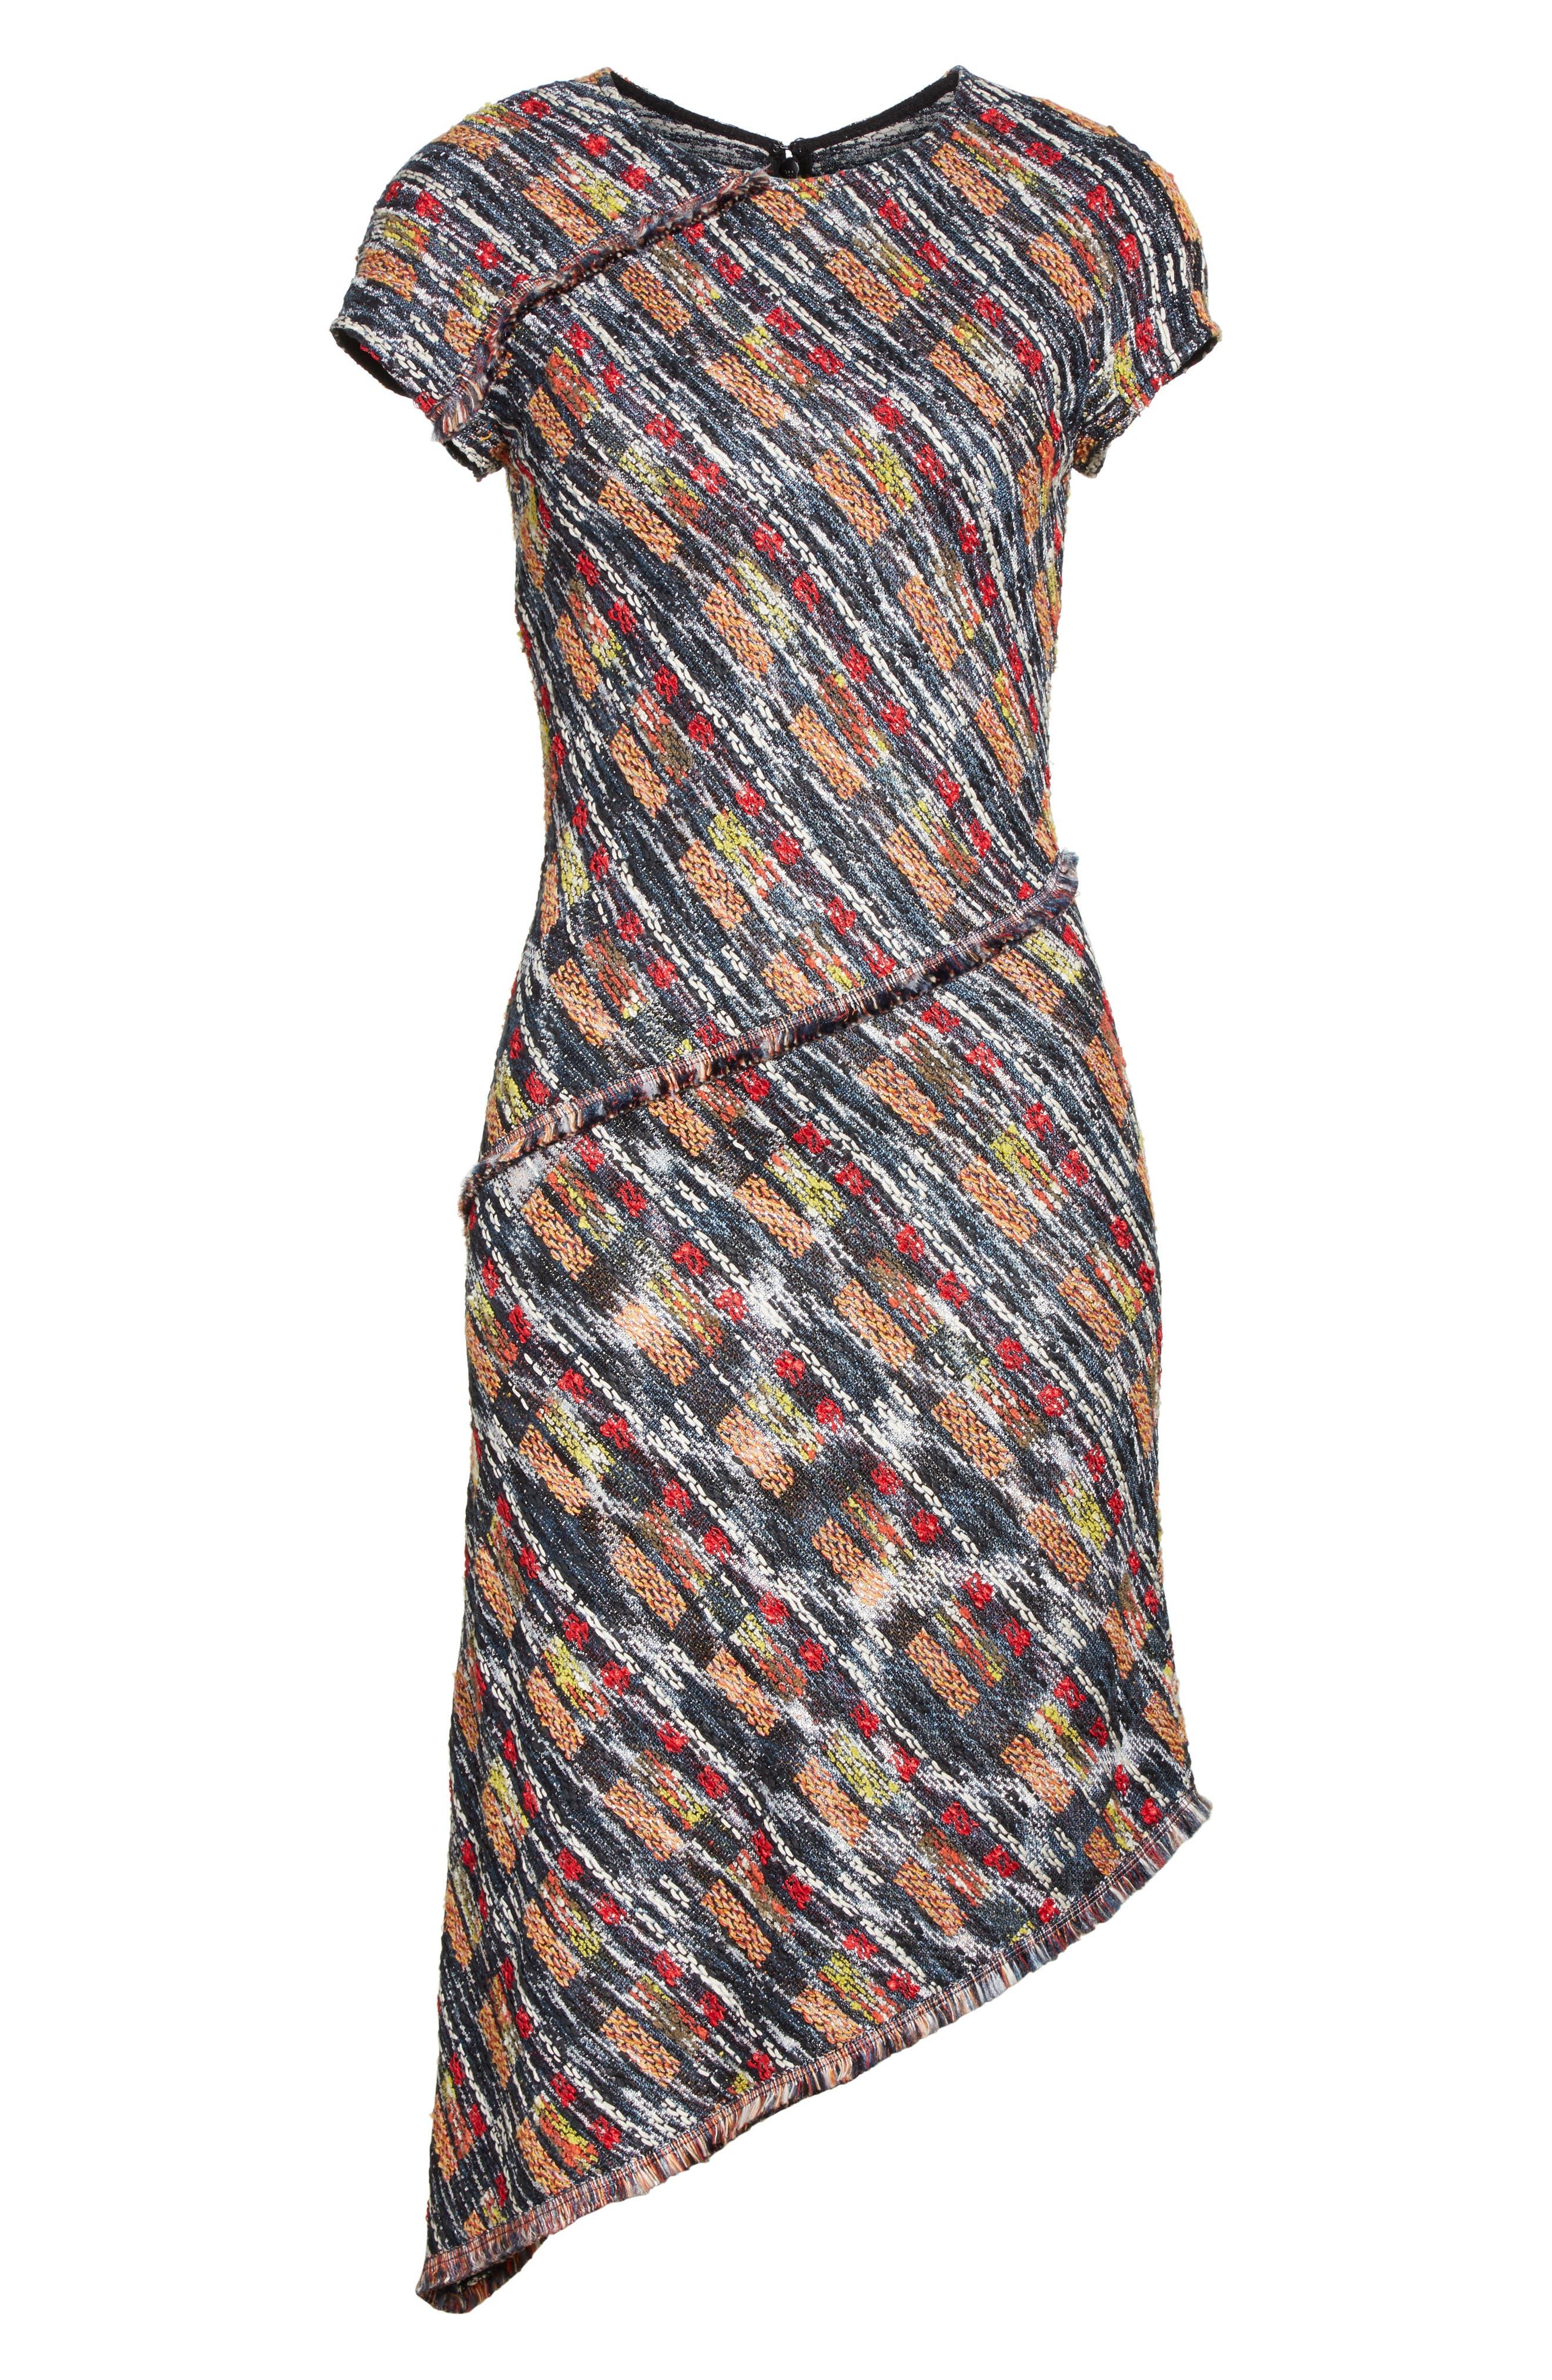 Painterly Tweed Knit Asymmetrical Dress,                             Alternate thumbnail 7, color,                             Caviar Multi